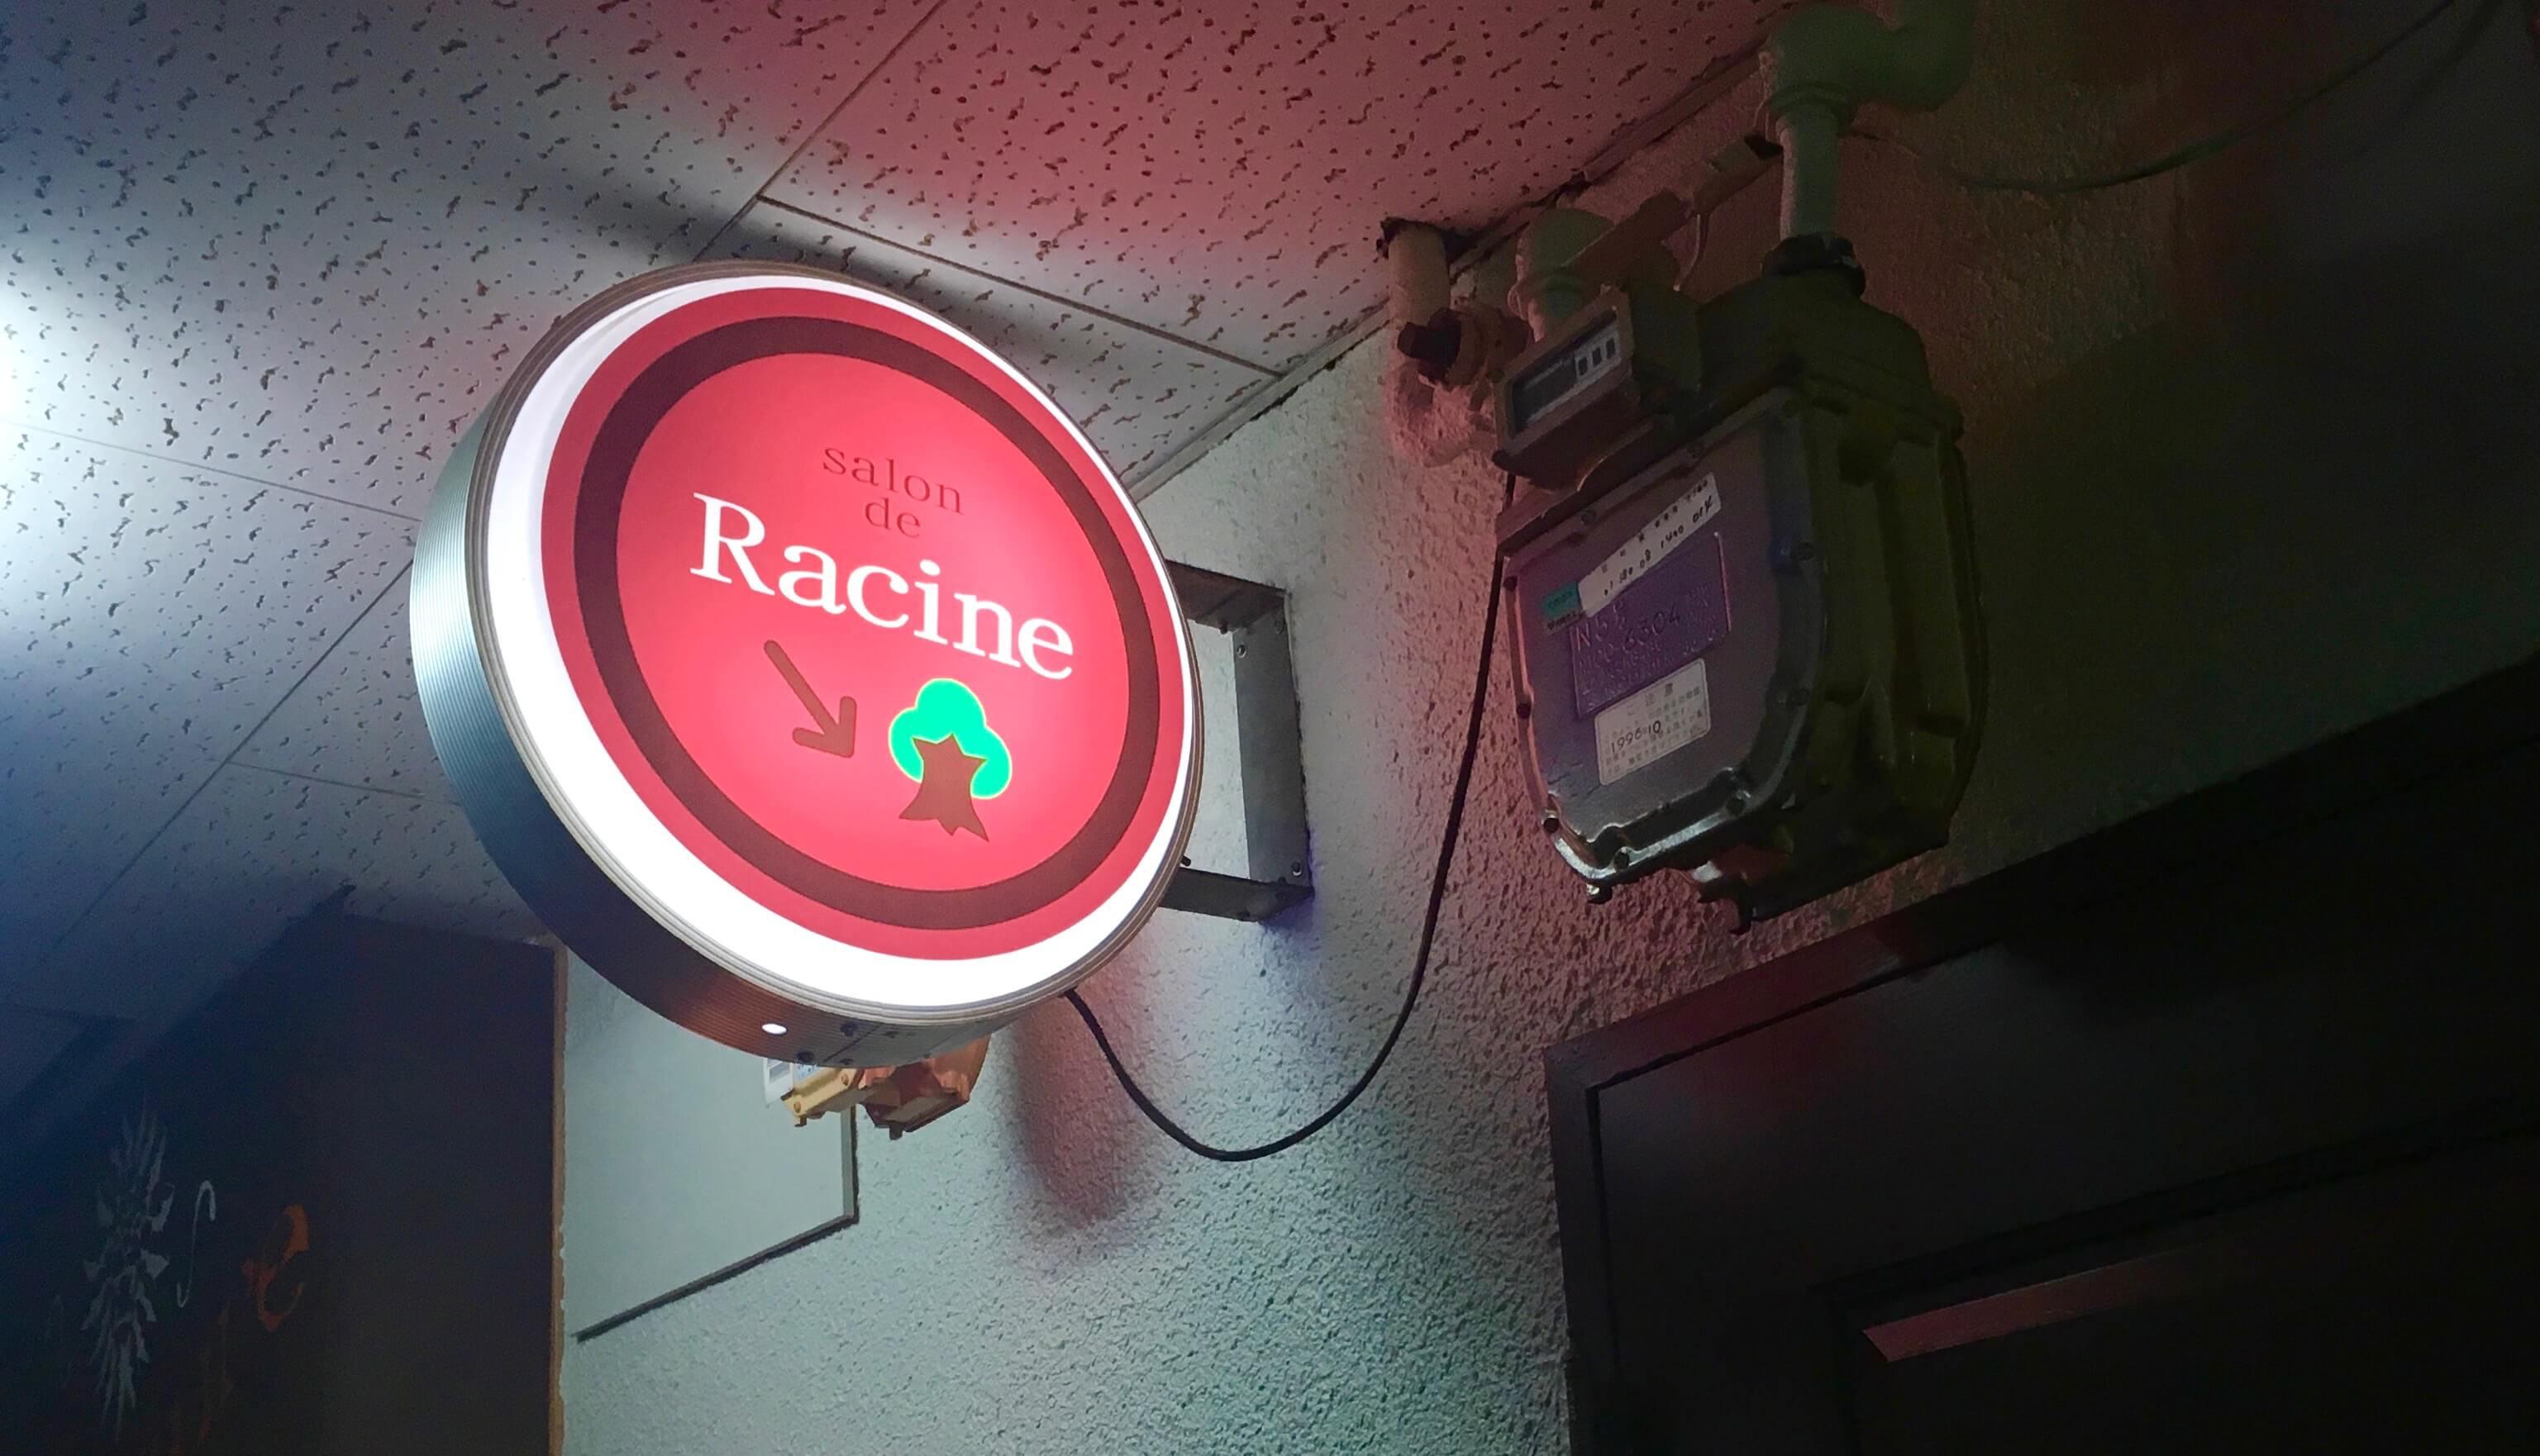 racine バー